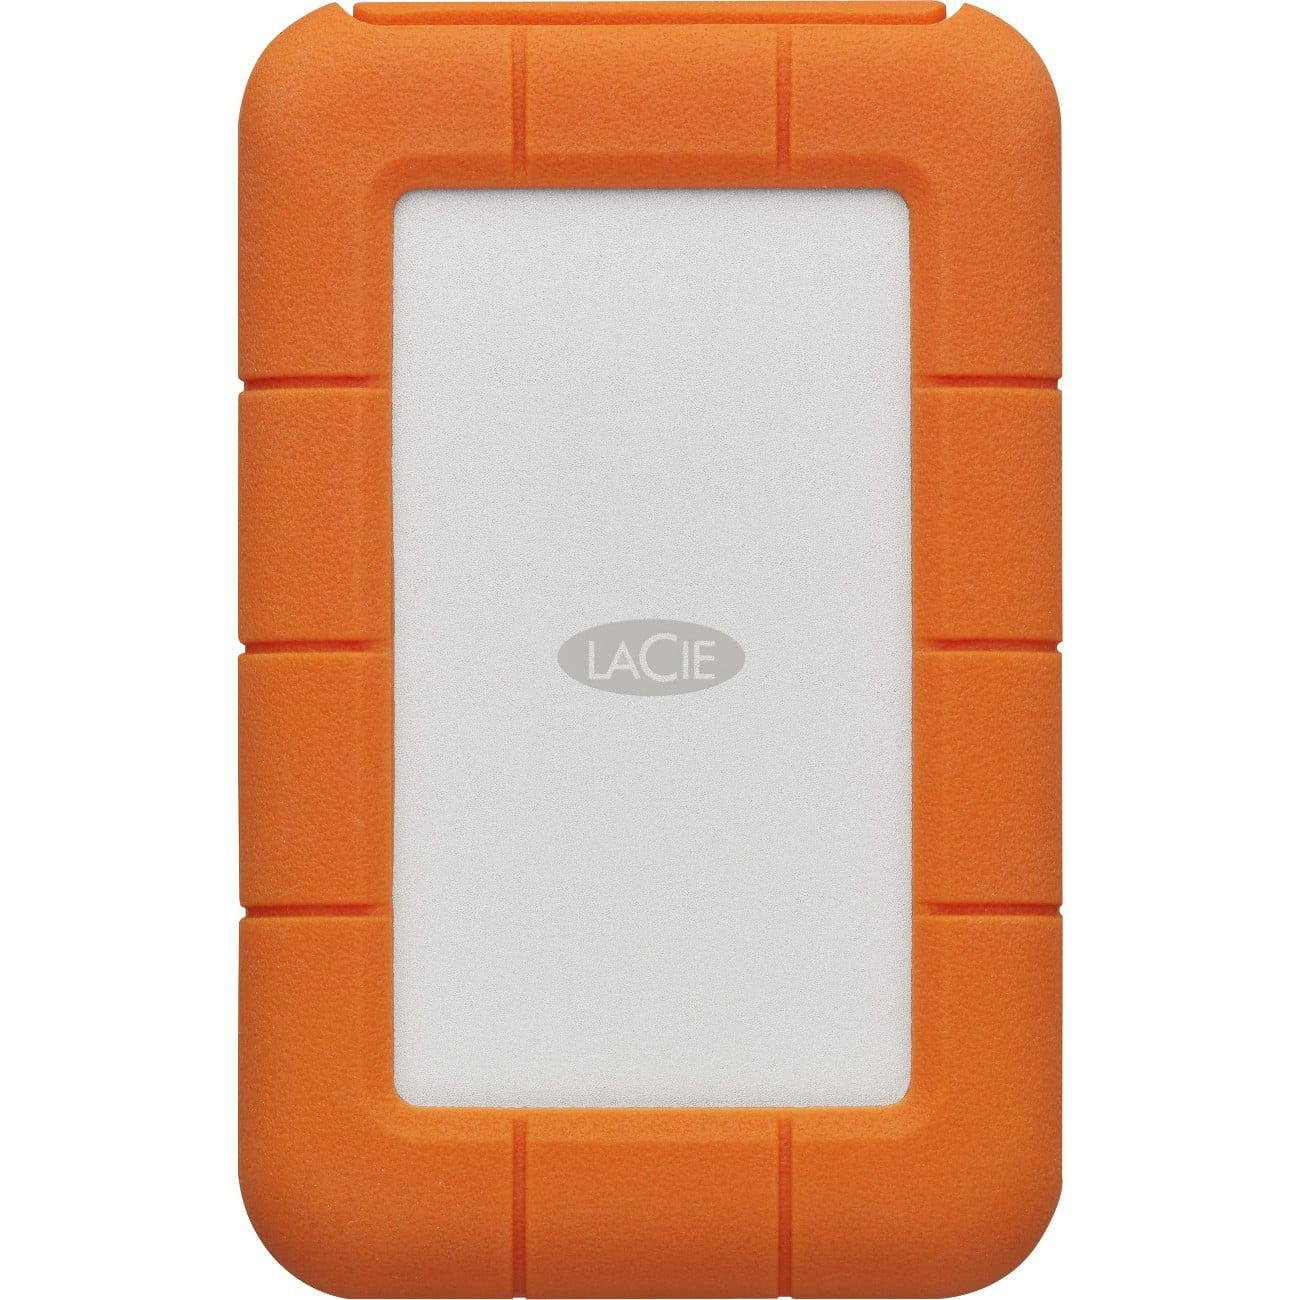 Lacie STFR2000403 Seagate Lacie Rugged Secured 2tb Usb-c Portable Hard Drive Orange